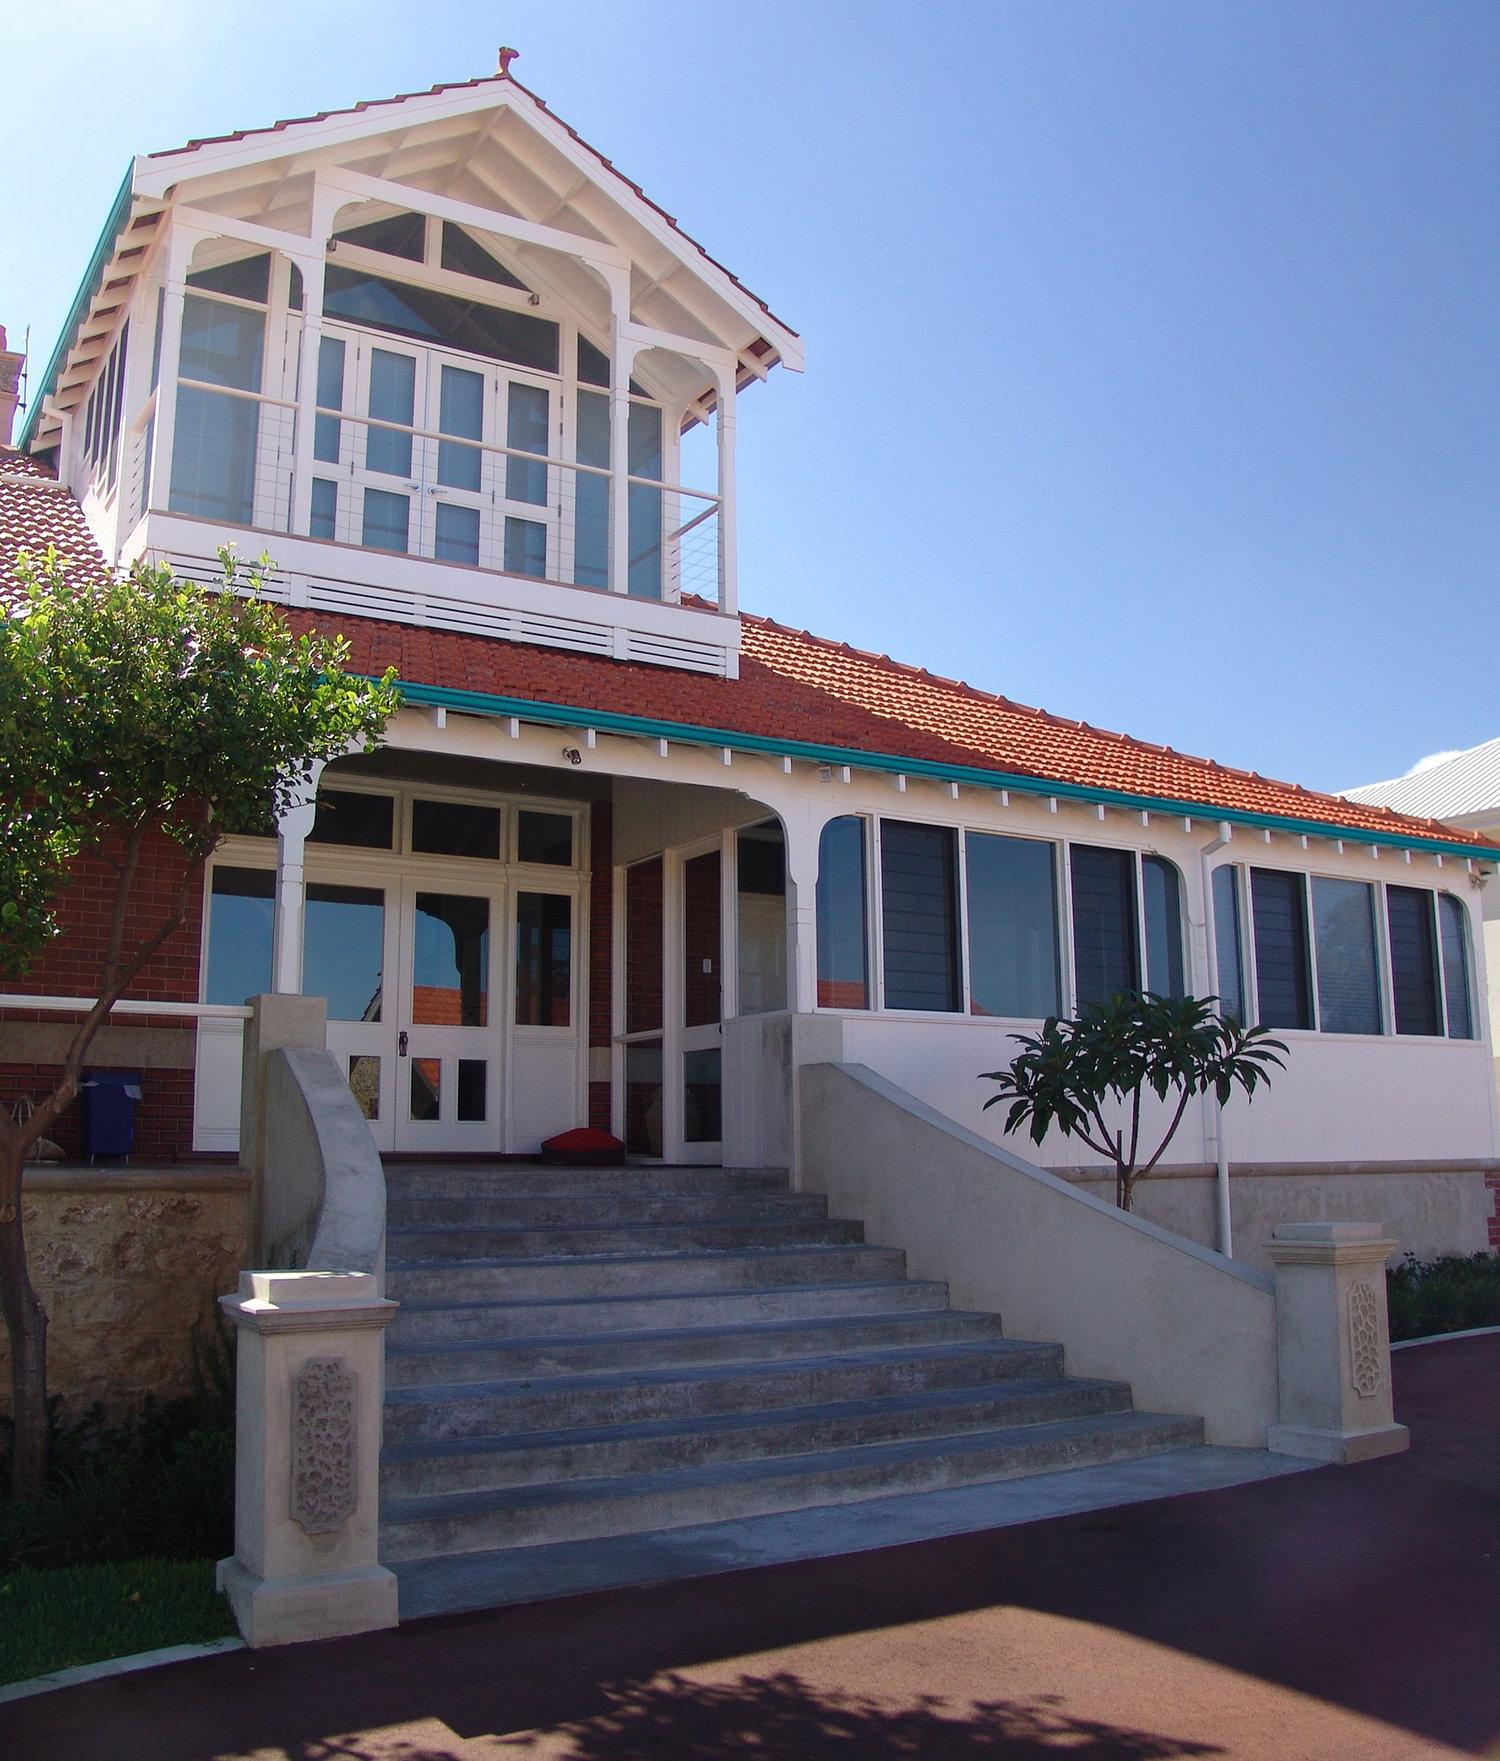 2005 City of Fremantle Heritage Award  Special CommendationFERNIEHURST -